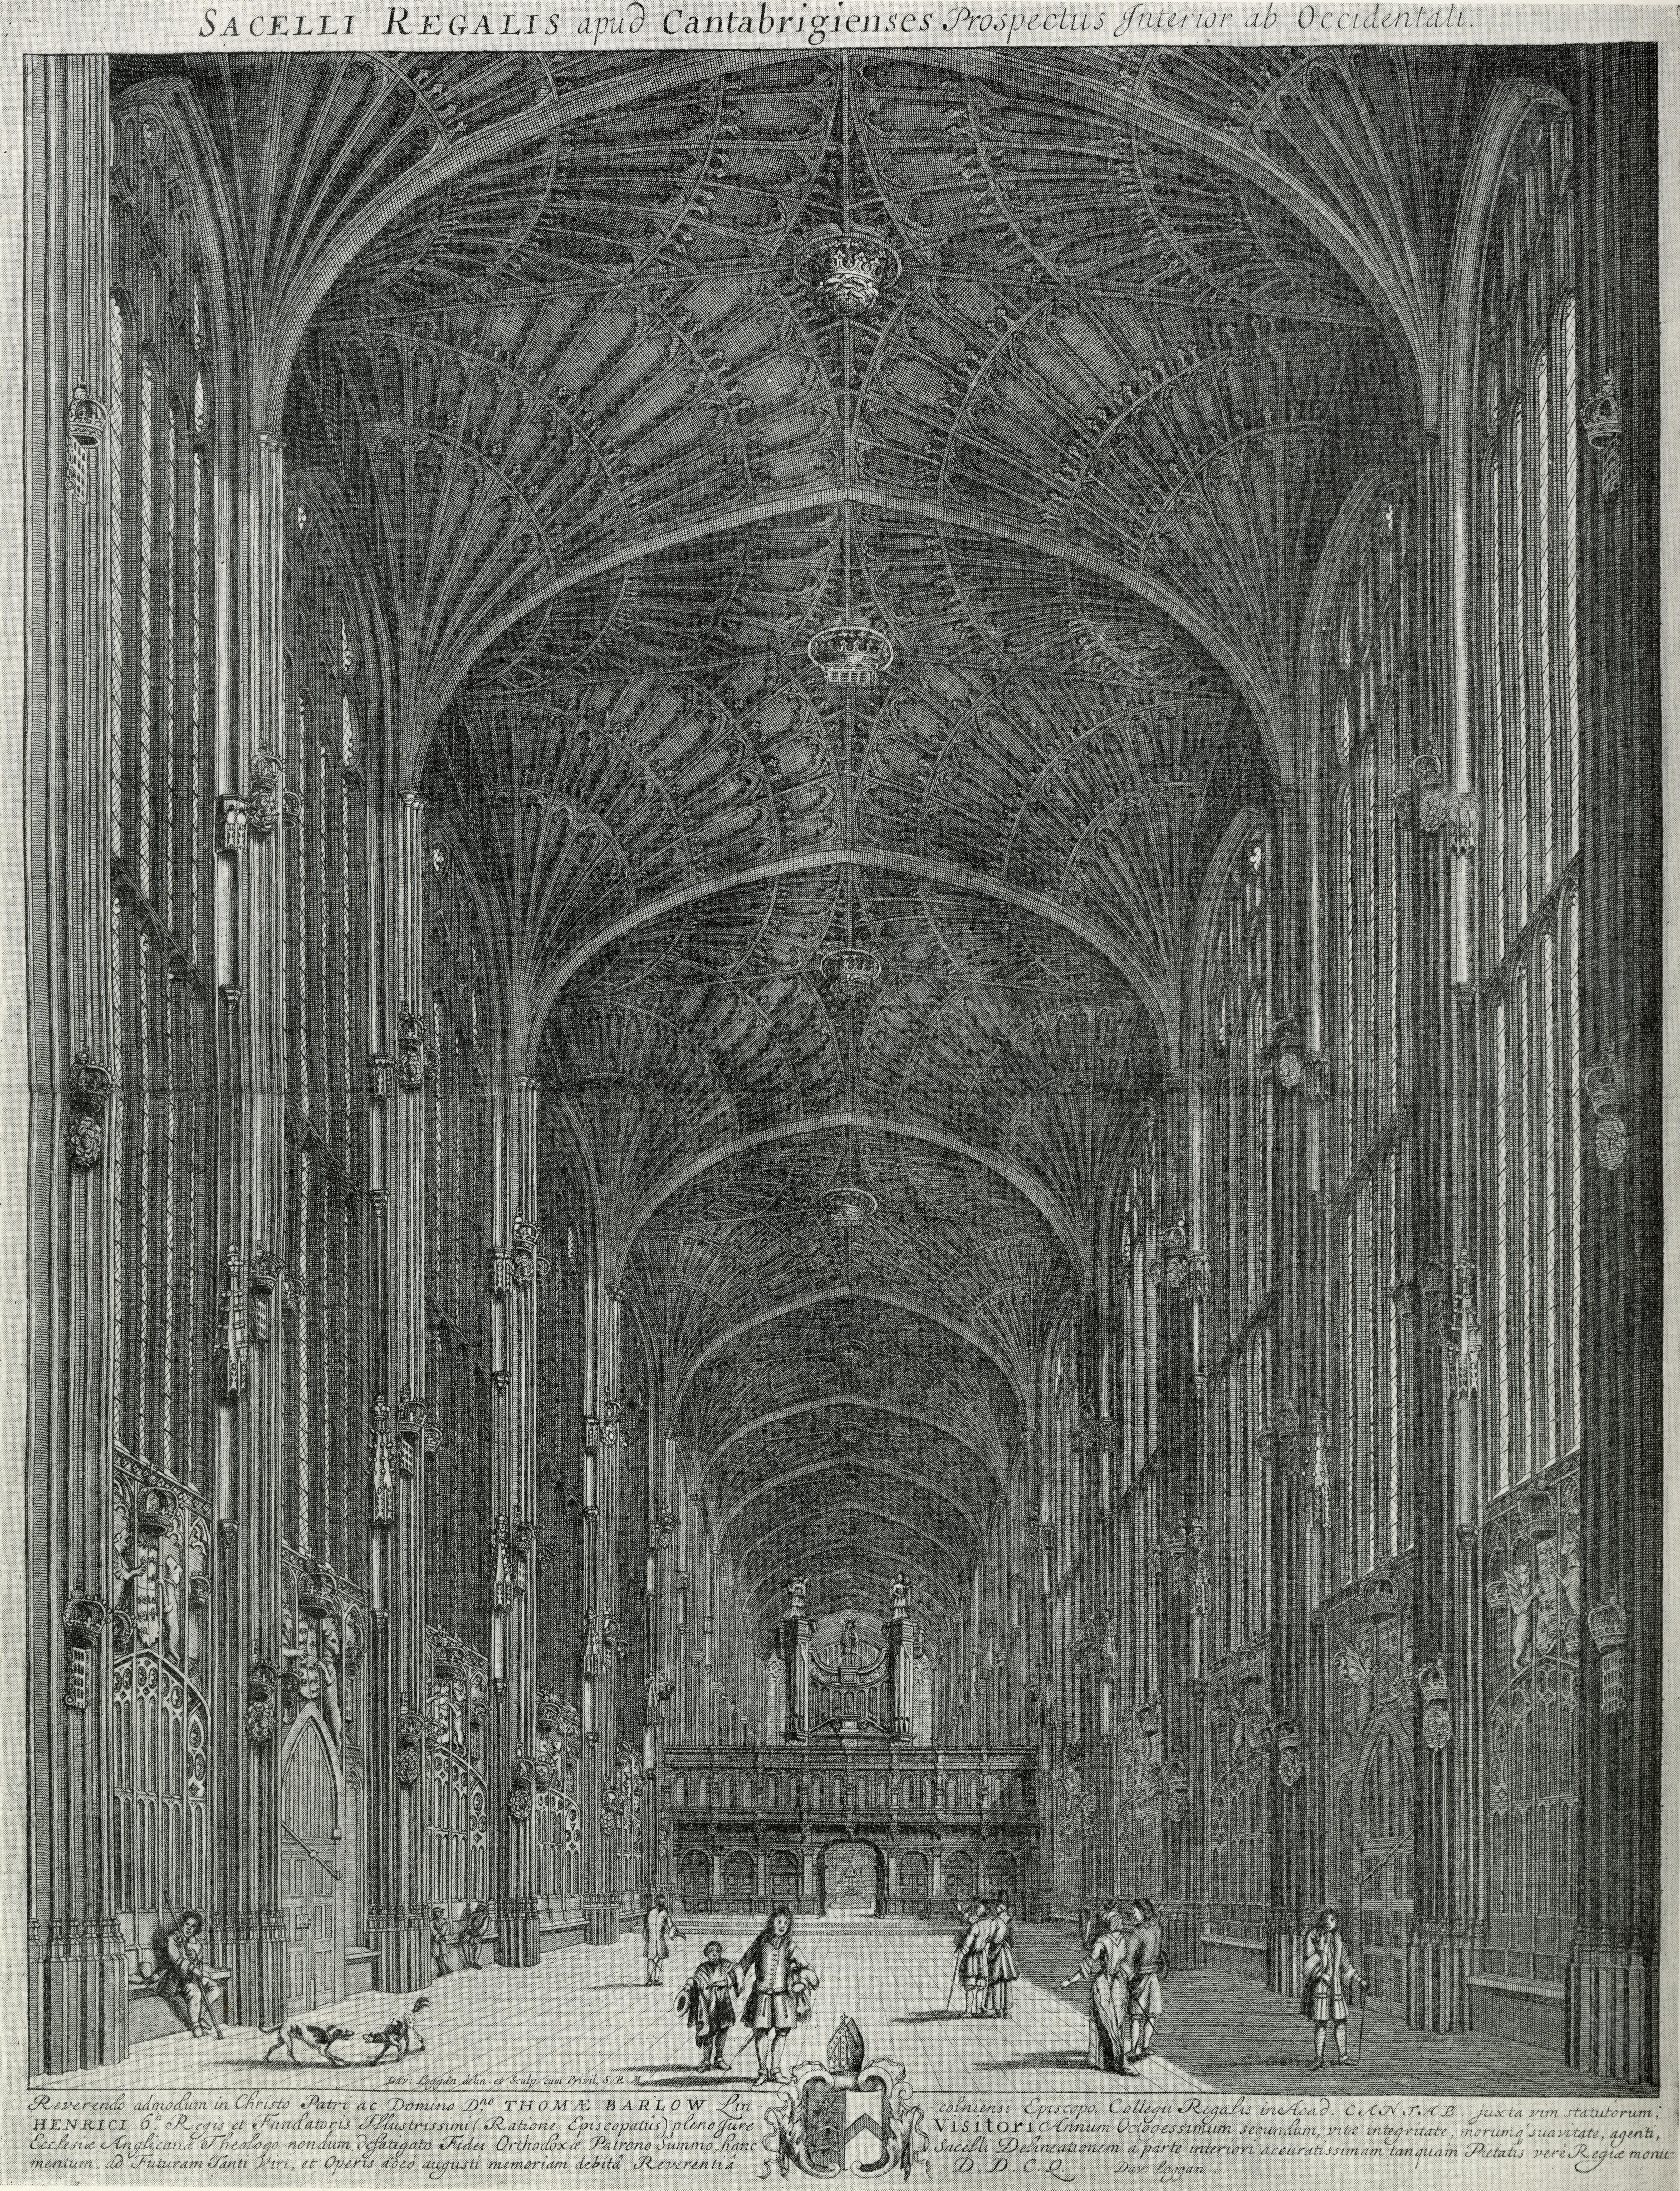 The organ case c. 1690 had angels. David Loggan, Cantabrigia Illustrata (Shelfmark: NW CU VAE Log)